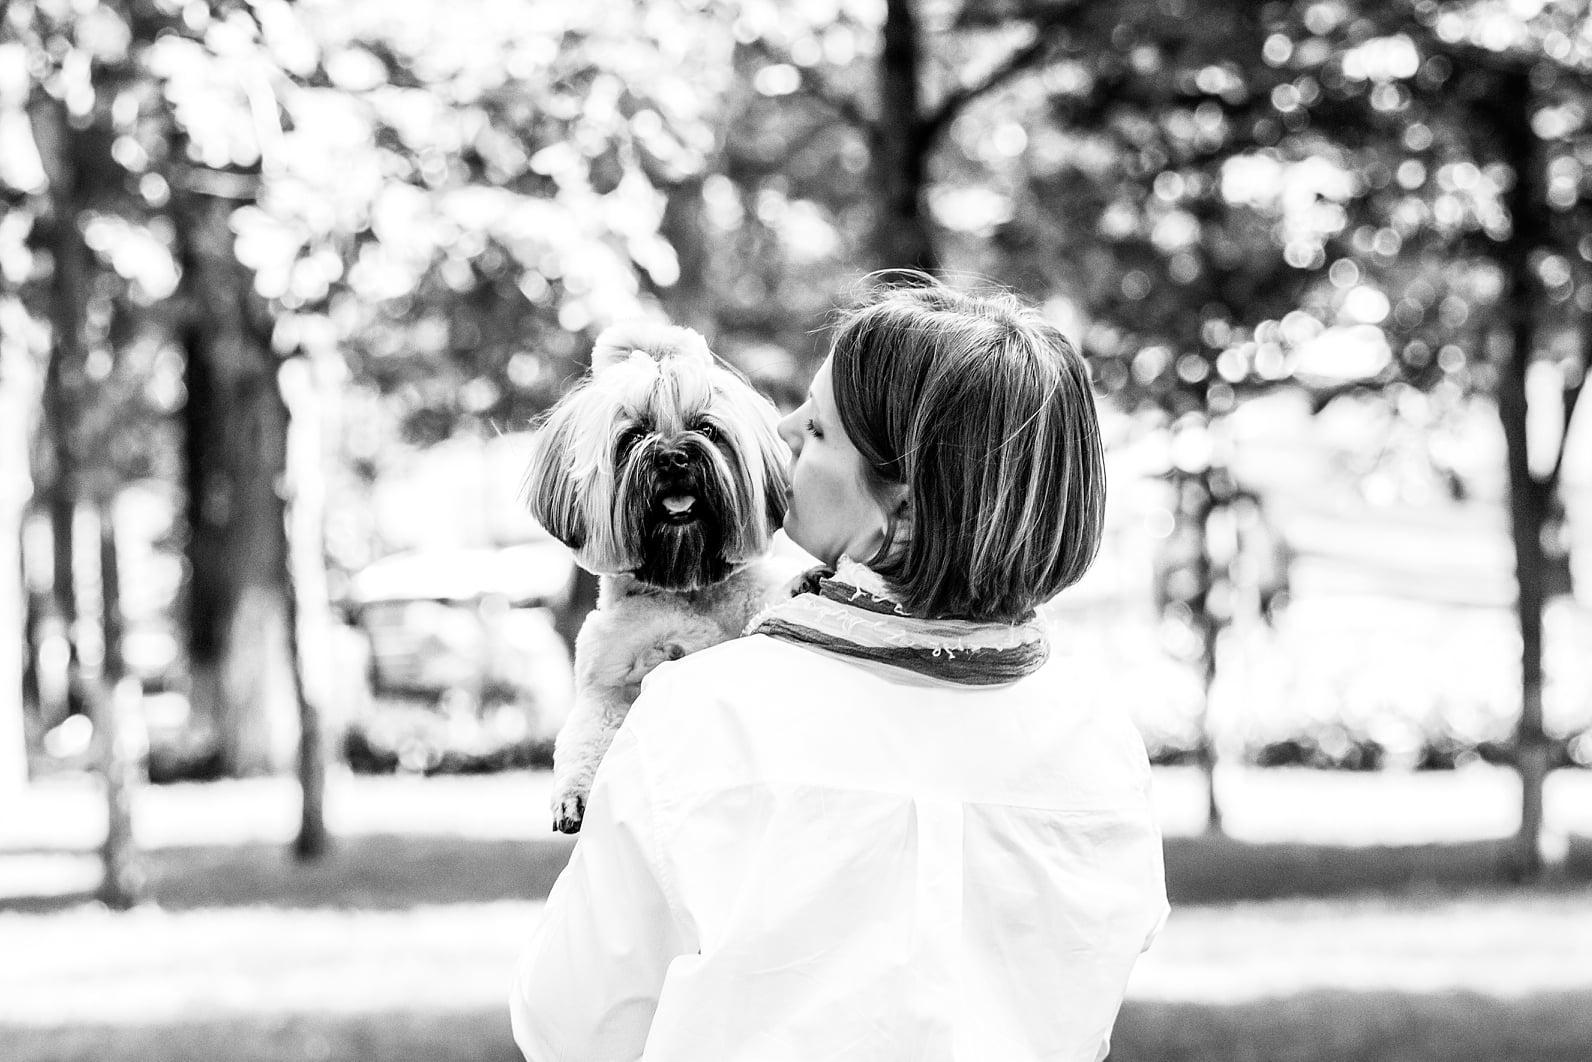 Fotosessia s lubimcem-Anjelika-Eshi (24)